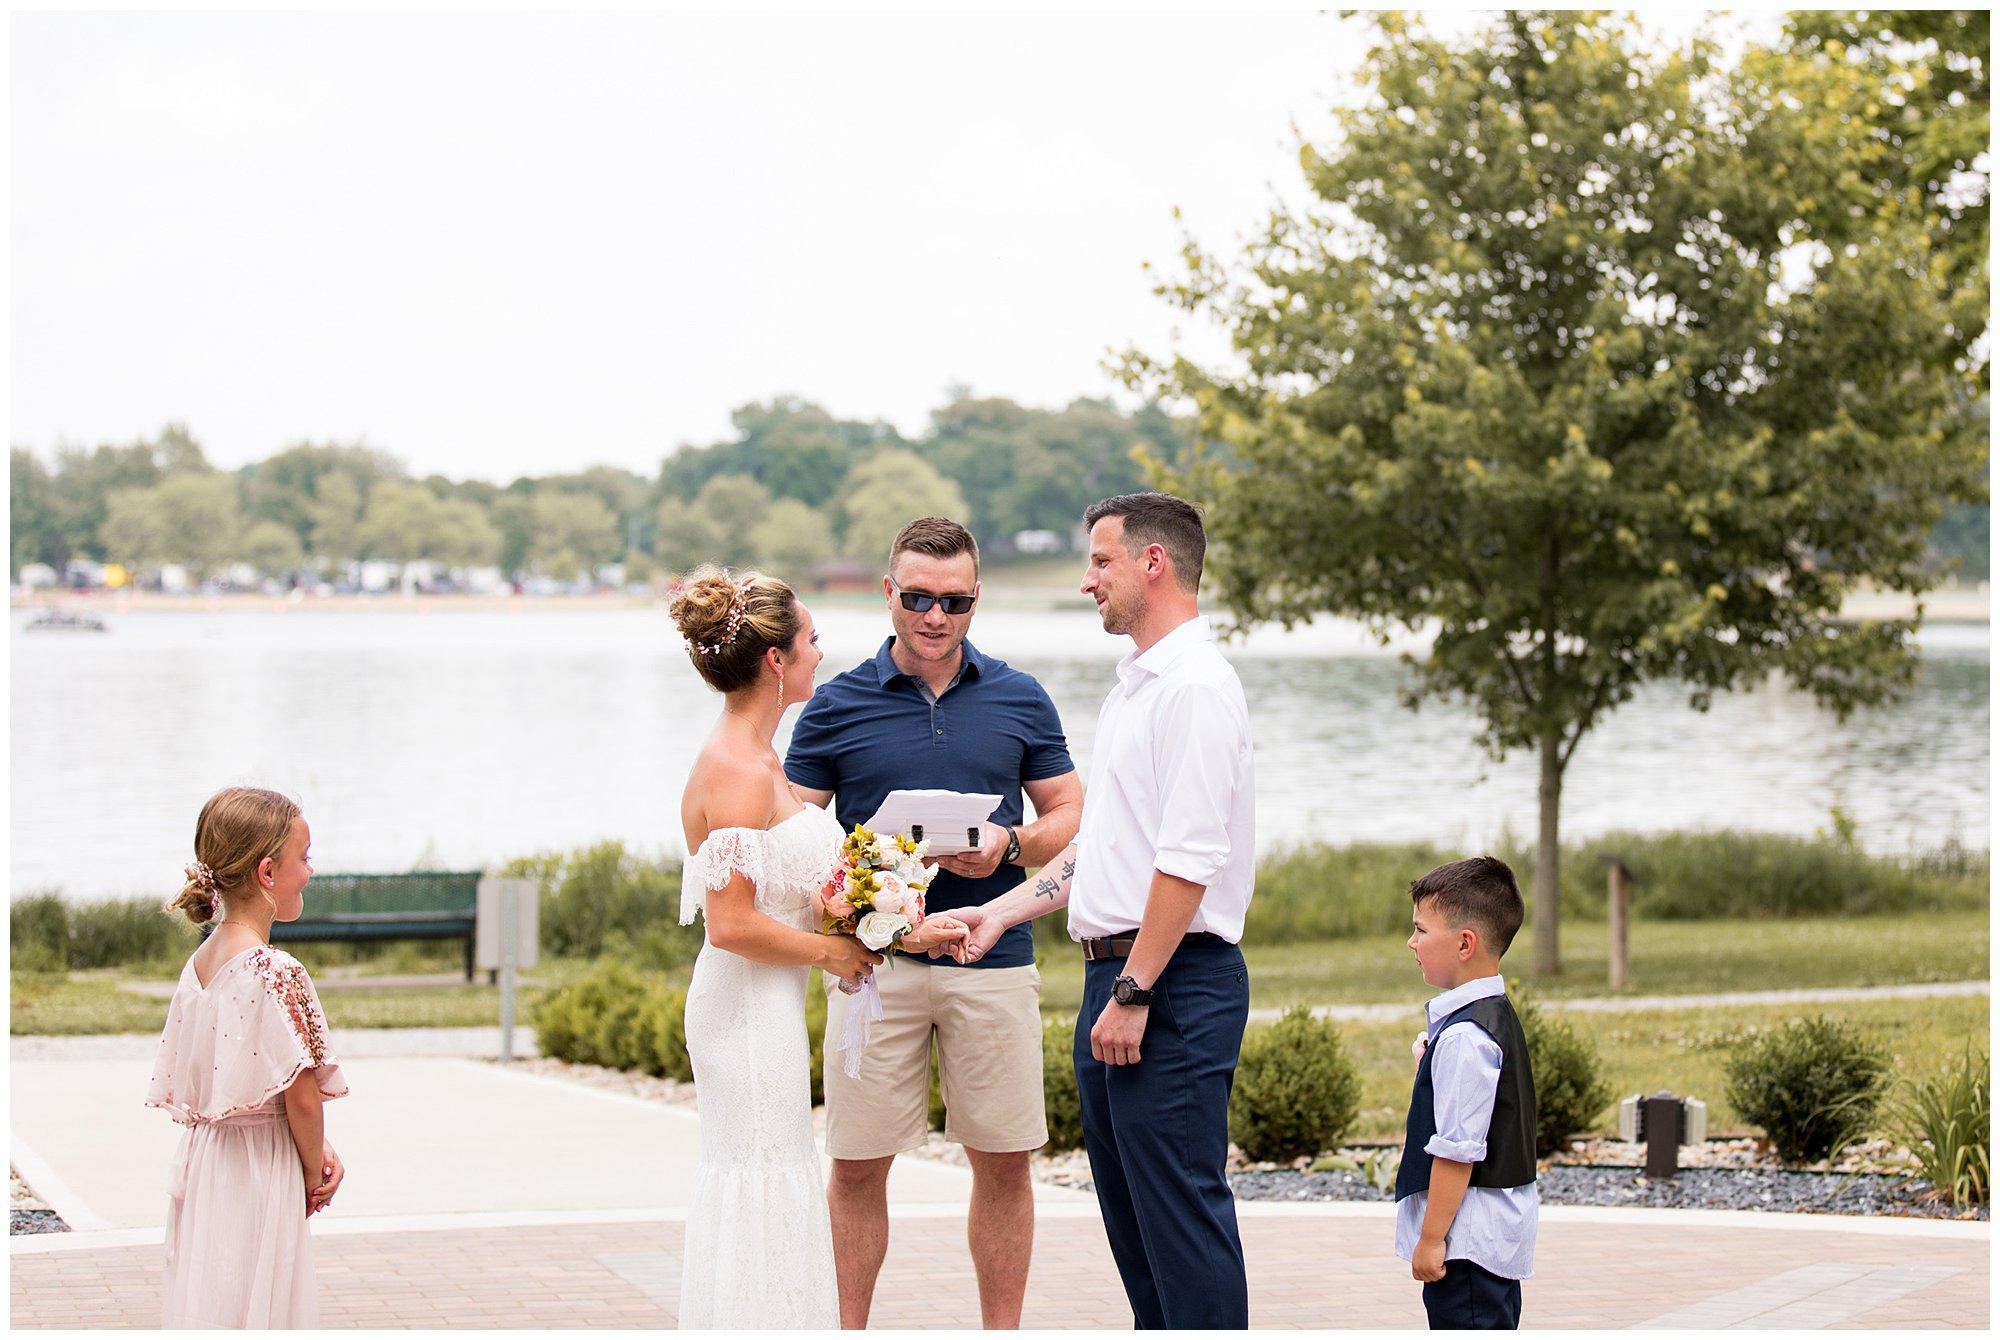 Lucerne Park Wedding Ceremony in Warsaw, Indiana